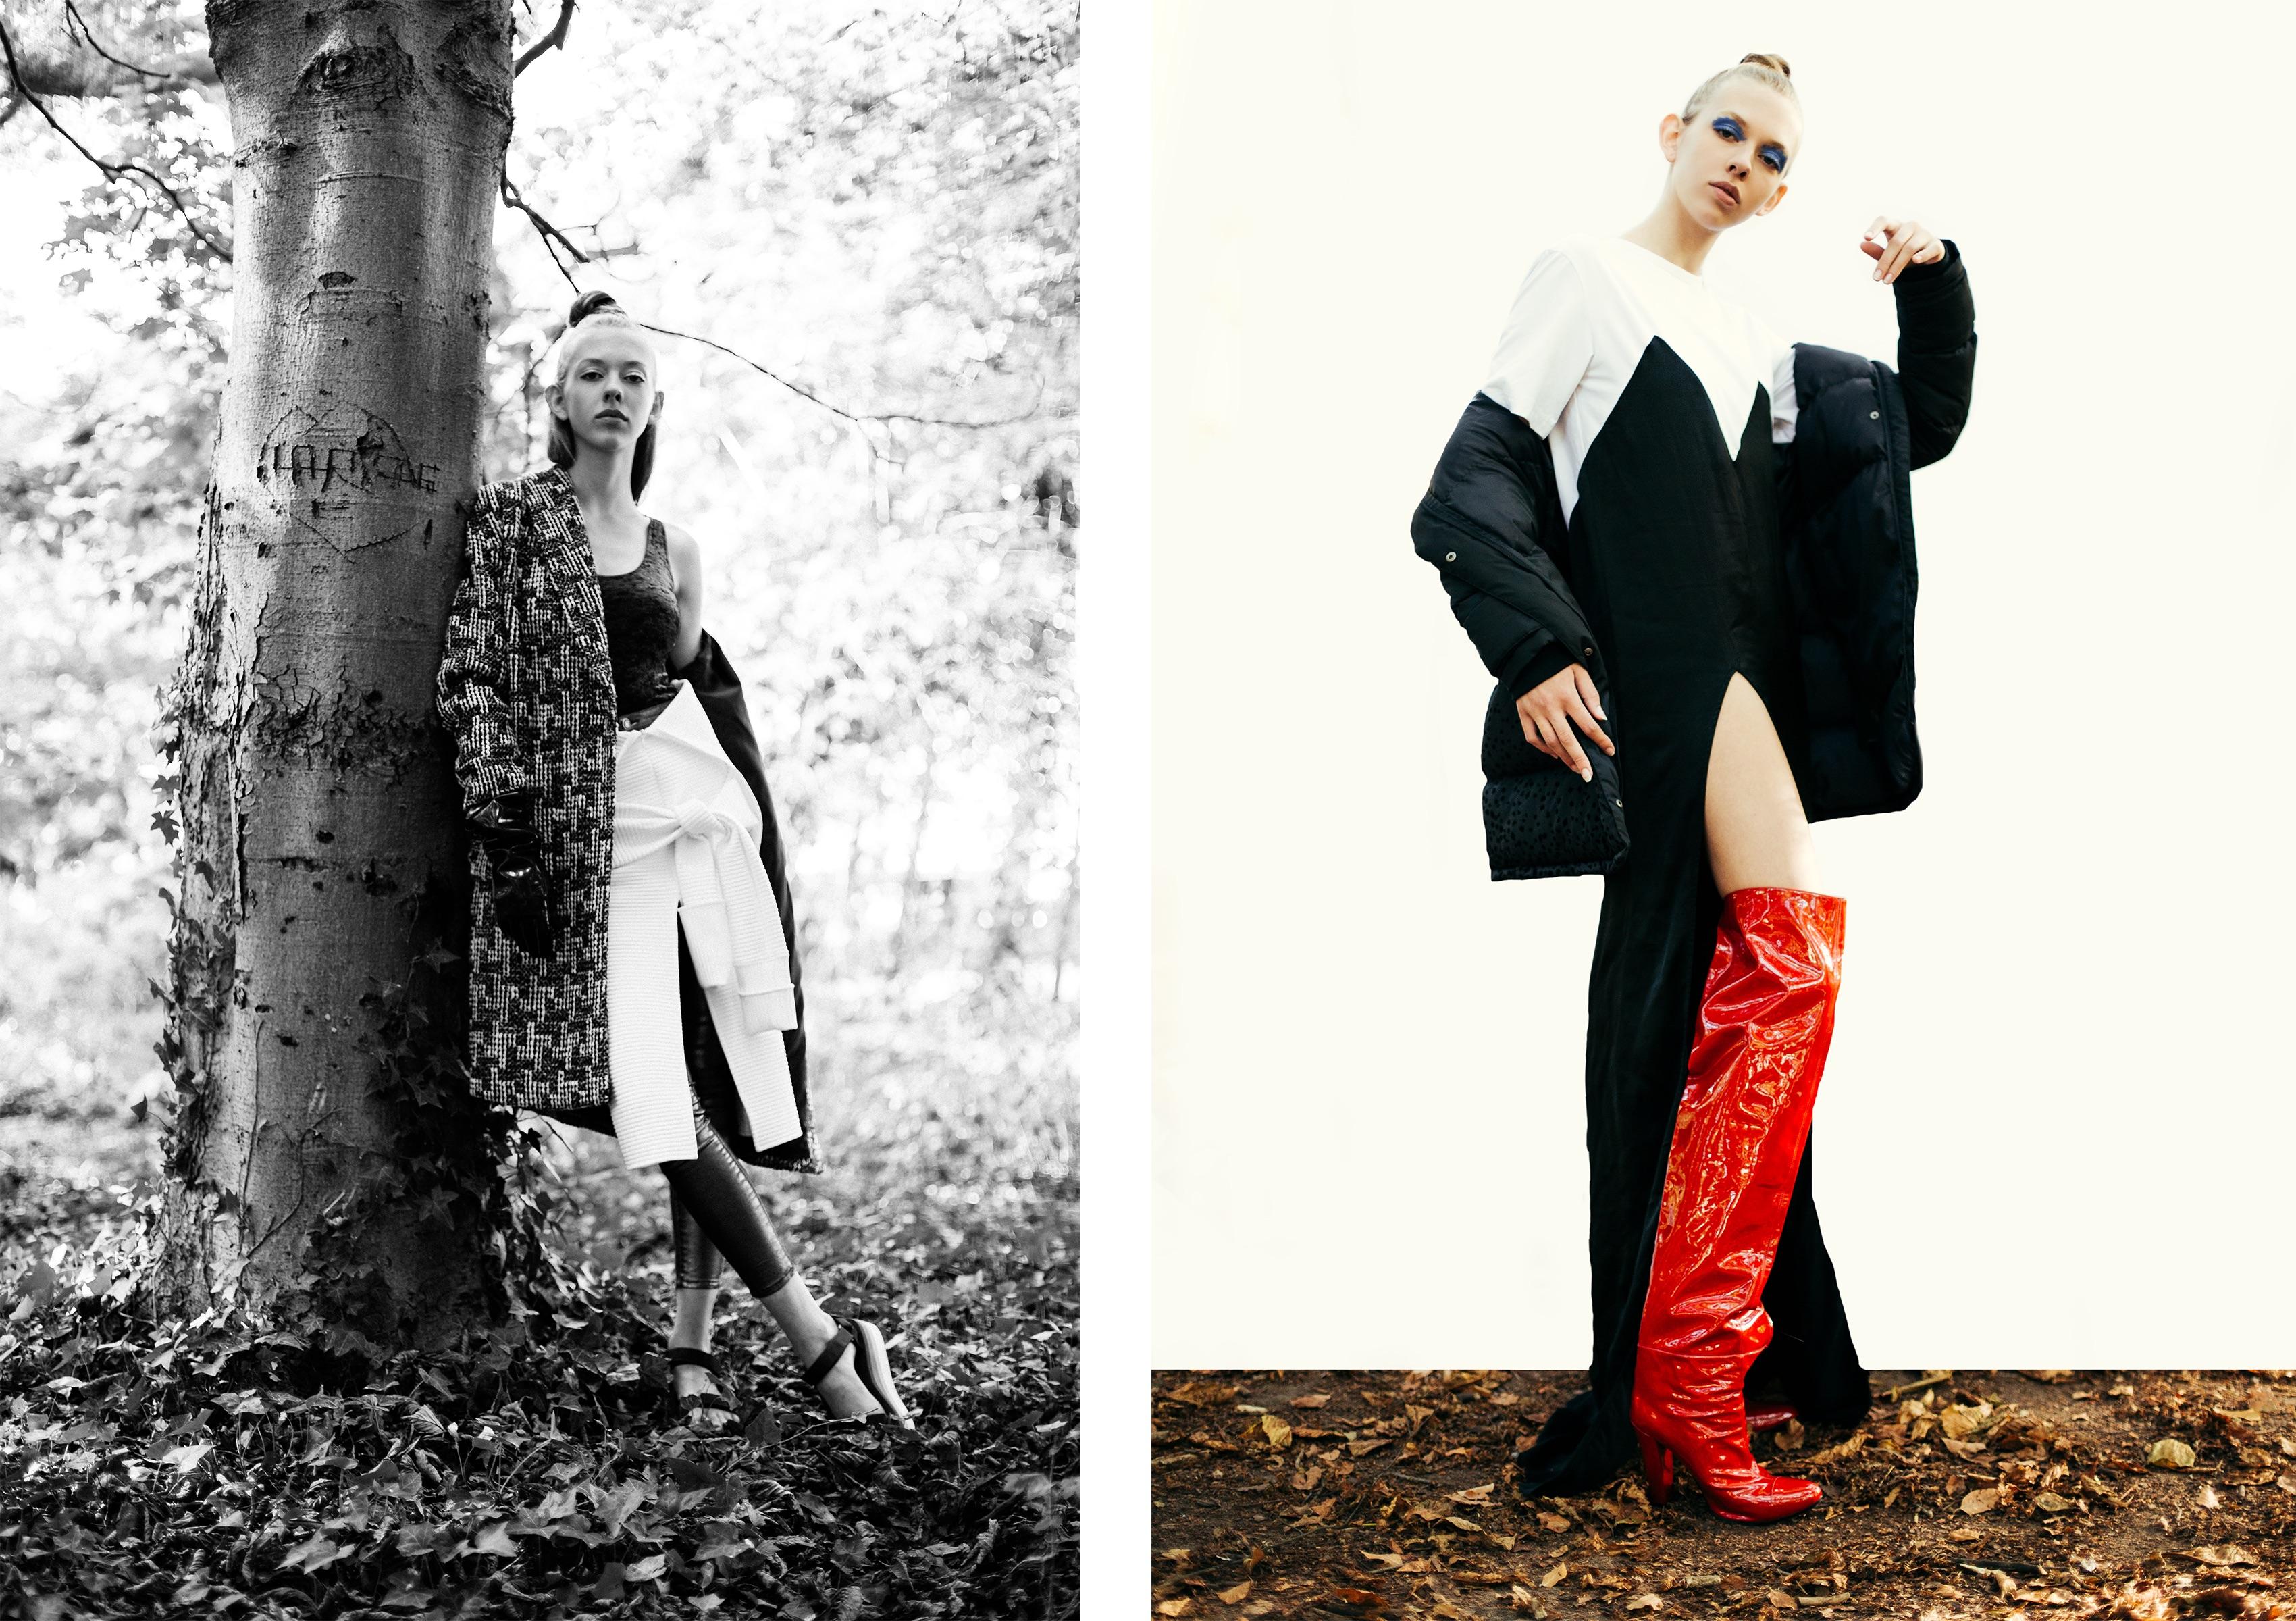 A gauche // Manteau : SEE YOU SOON; Body : WANDA NYLON; Robe blanche : WANDA NYLON; Pantalon : PRIMARK -- A droite : Robe, Bottes : WANDA NYLON; Manteau : SKUNKFUNK.